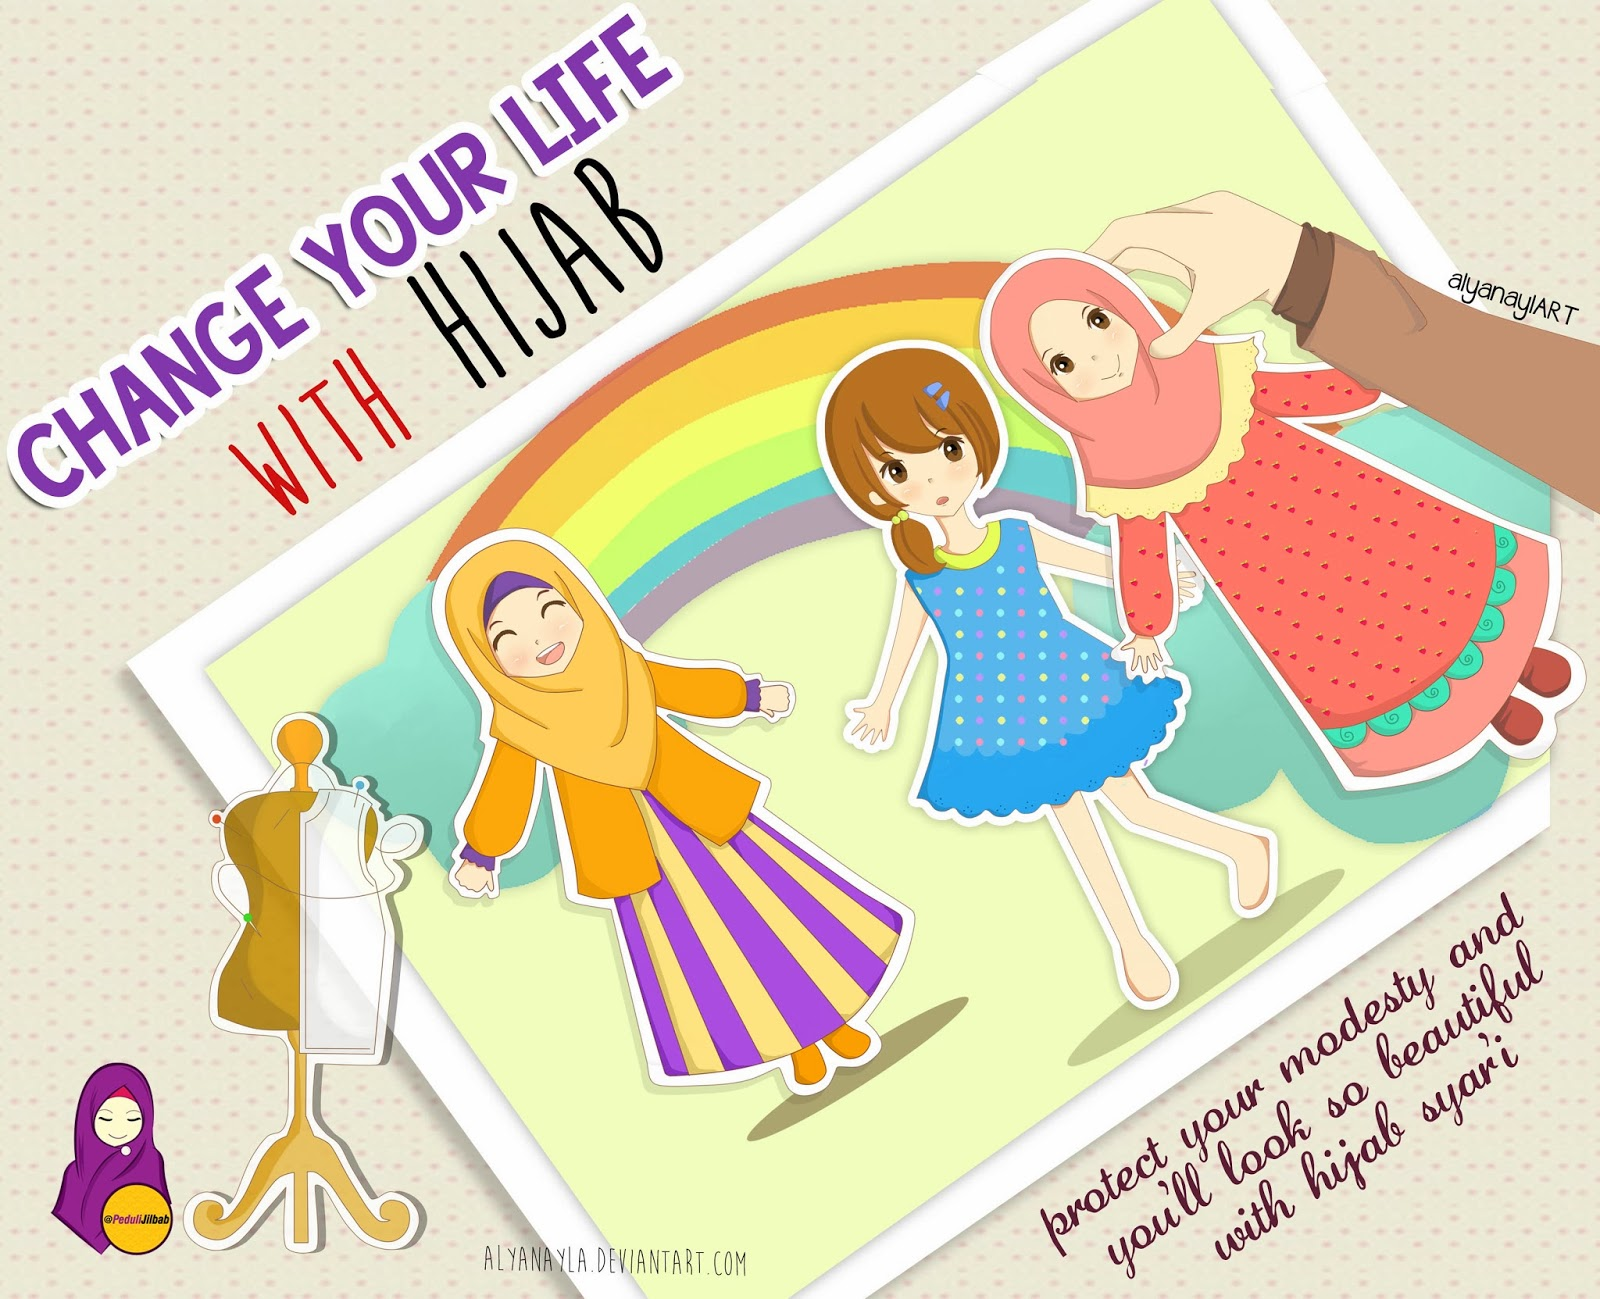 Gambar Kartun Muslimah Fotografer Gambar Kartun